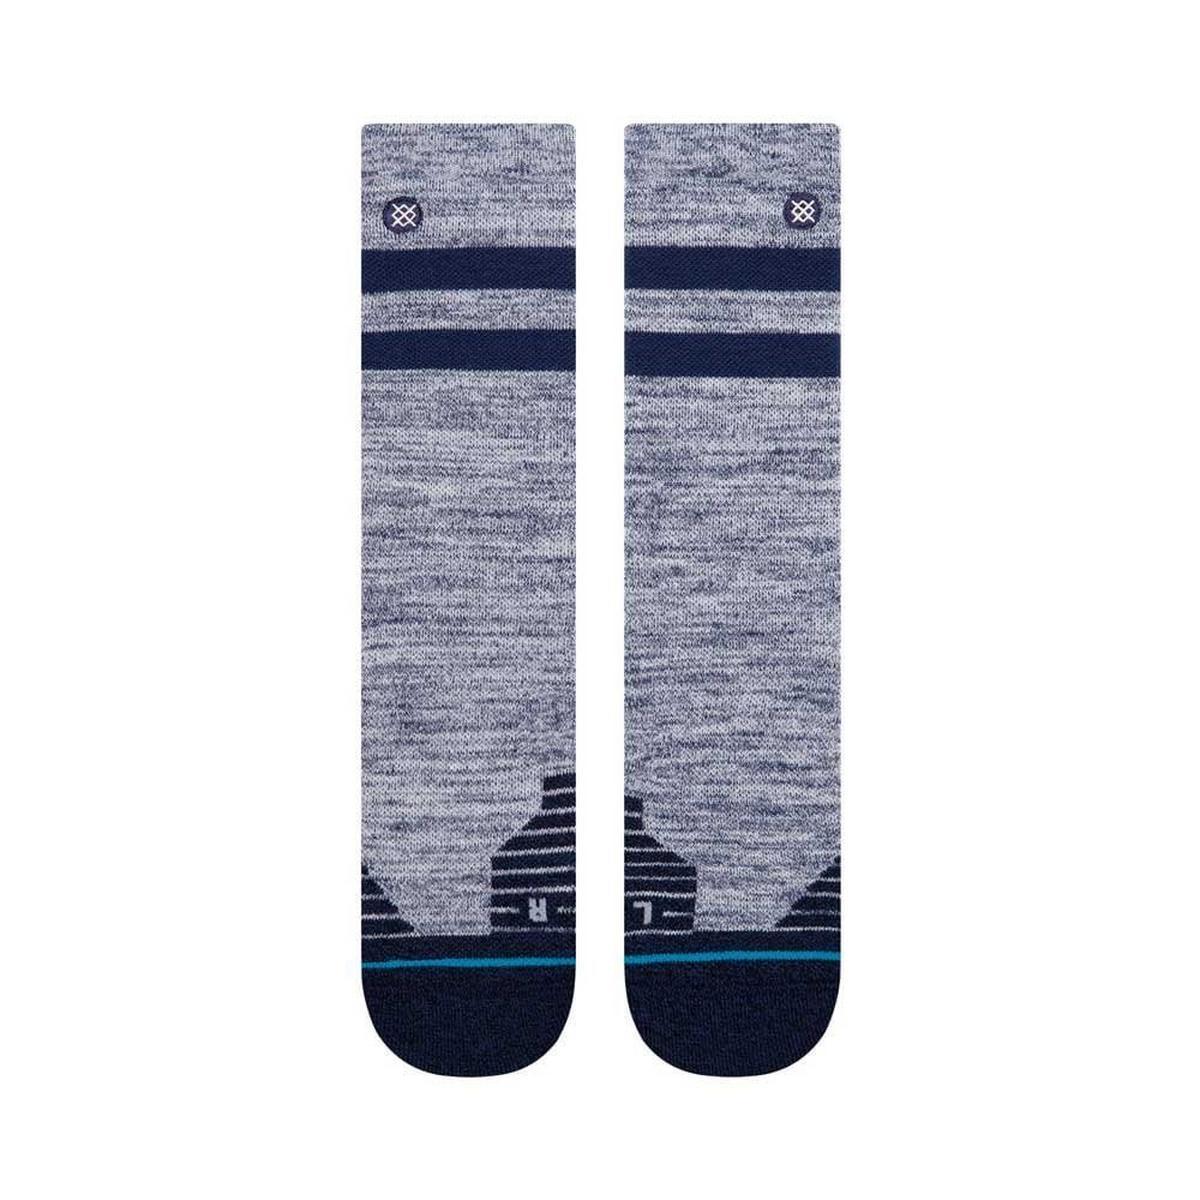 Stance Unisex Camper Socks - Navy